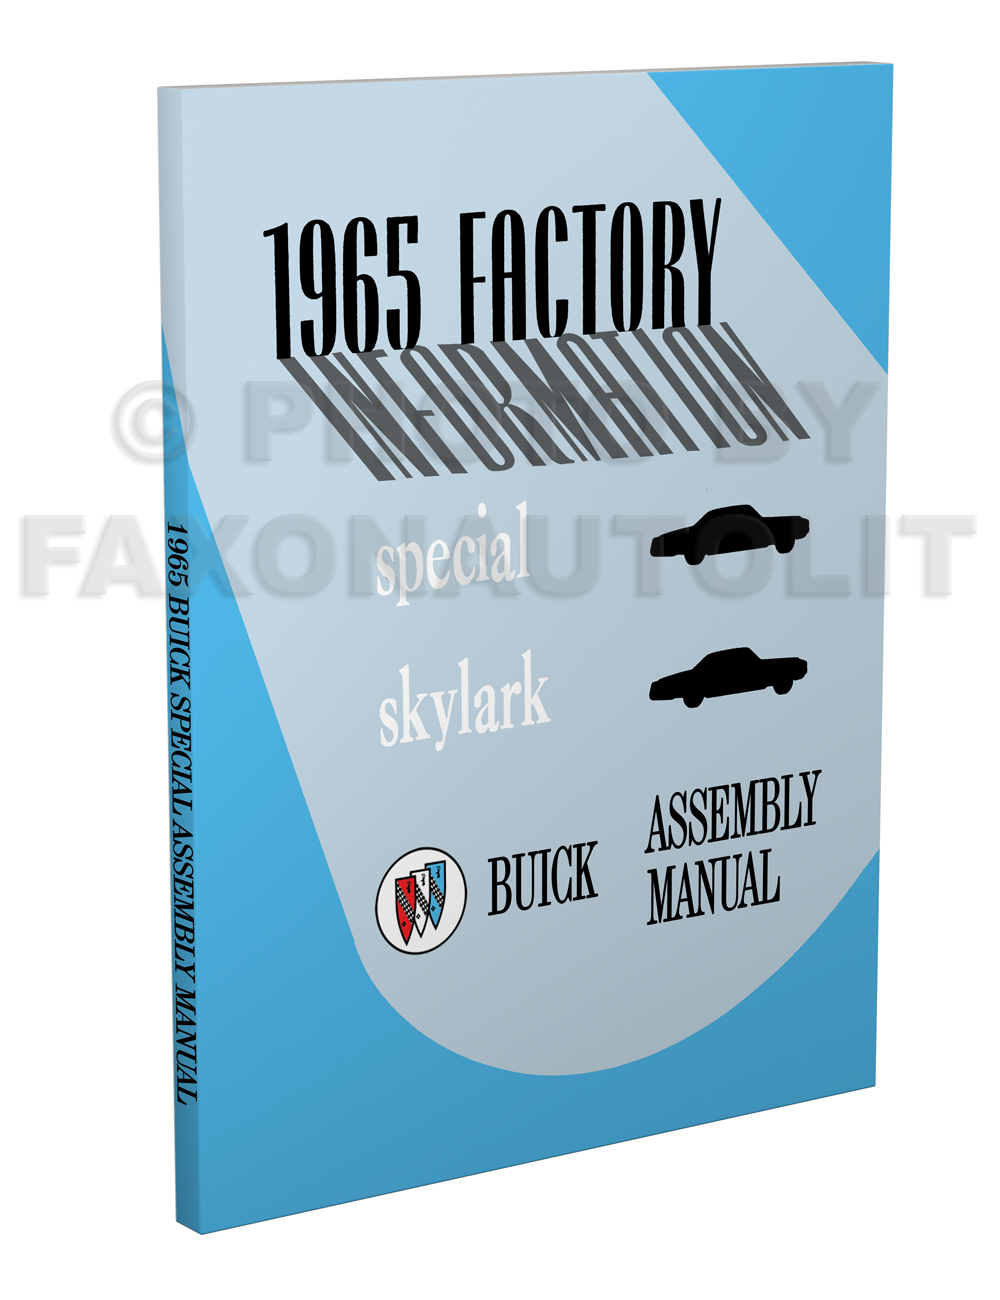 1965 Buick Factory Assembly Manual Special Skylark